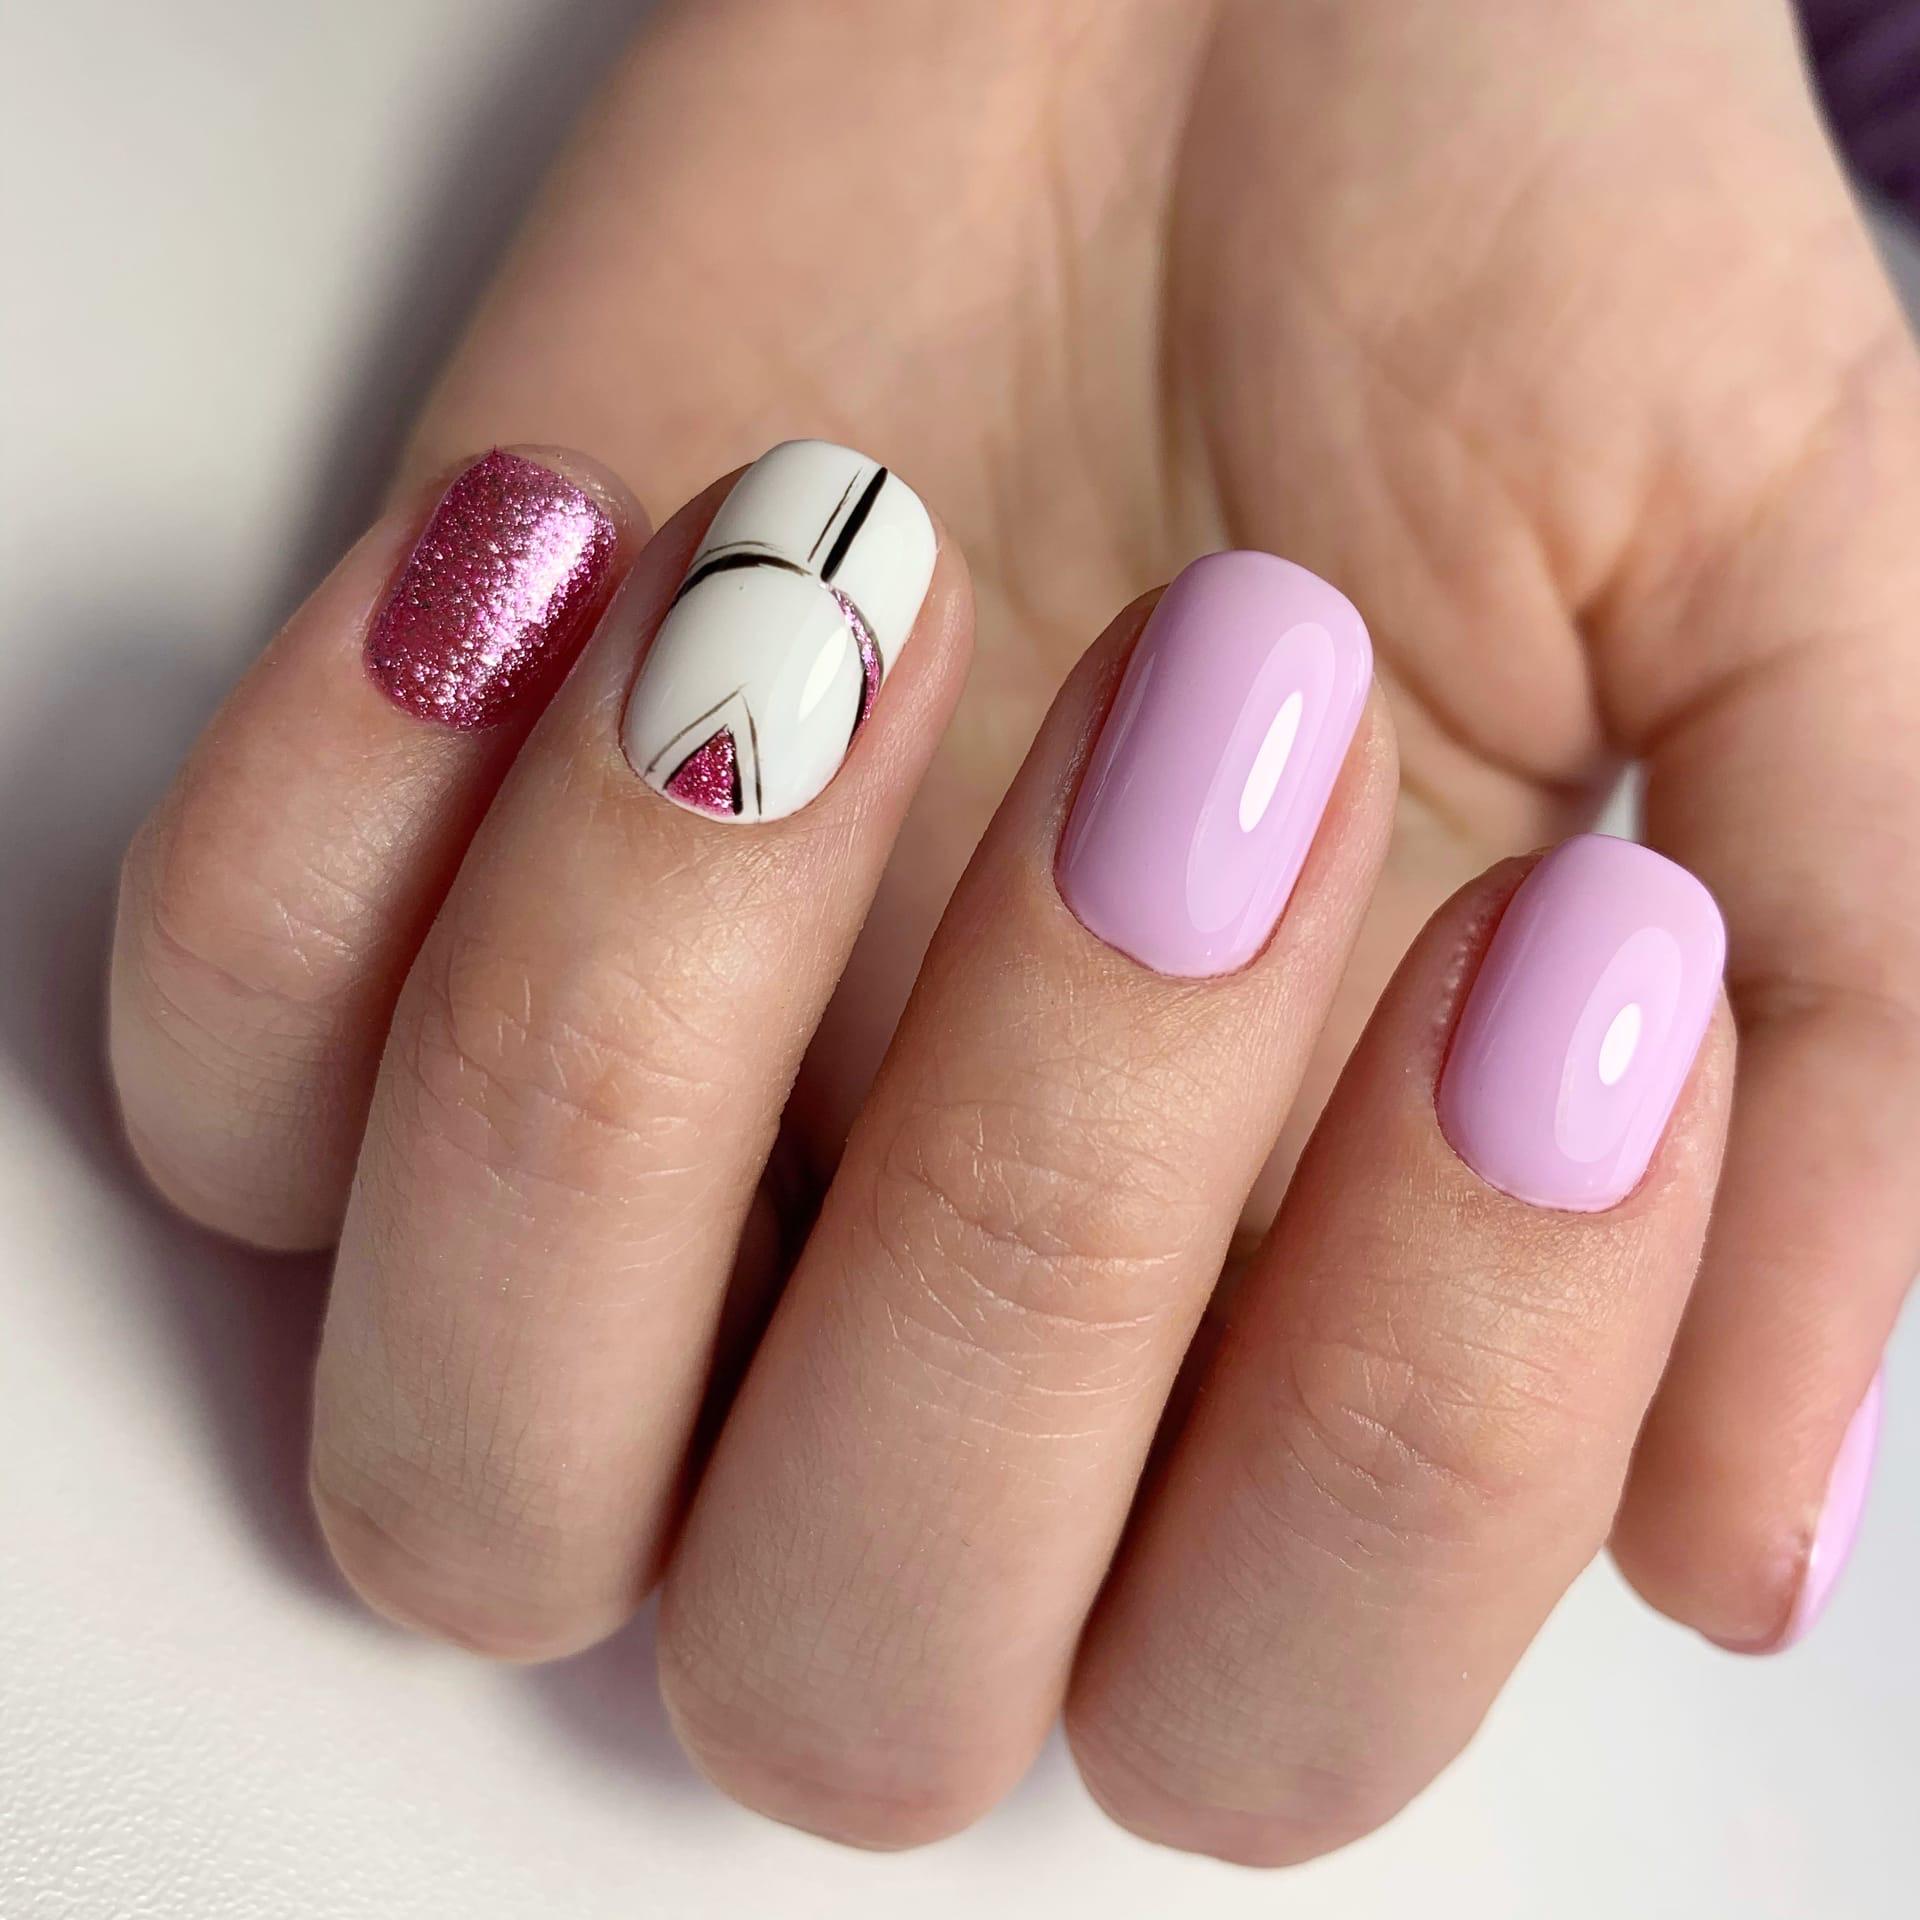 Геометрический маникюр с блестками в розовом цвете на короткие ногти.